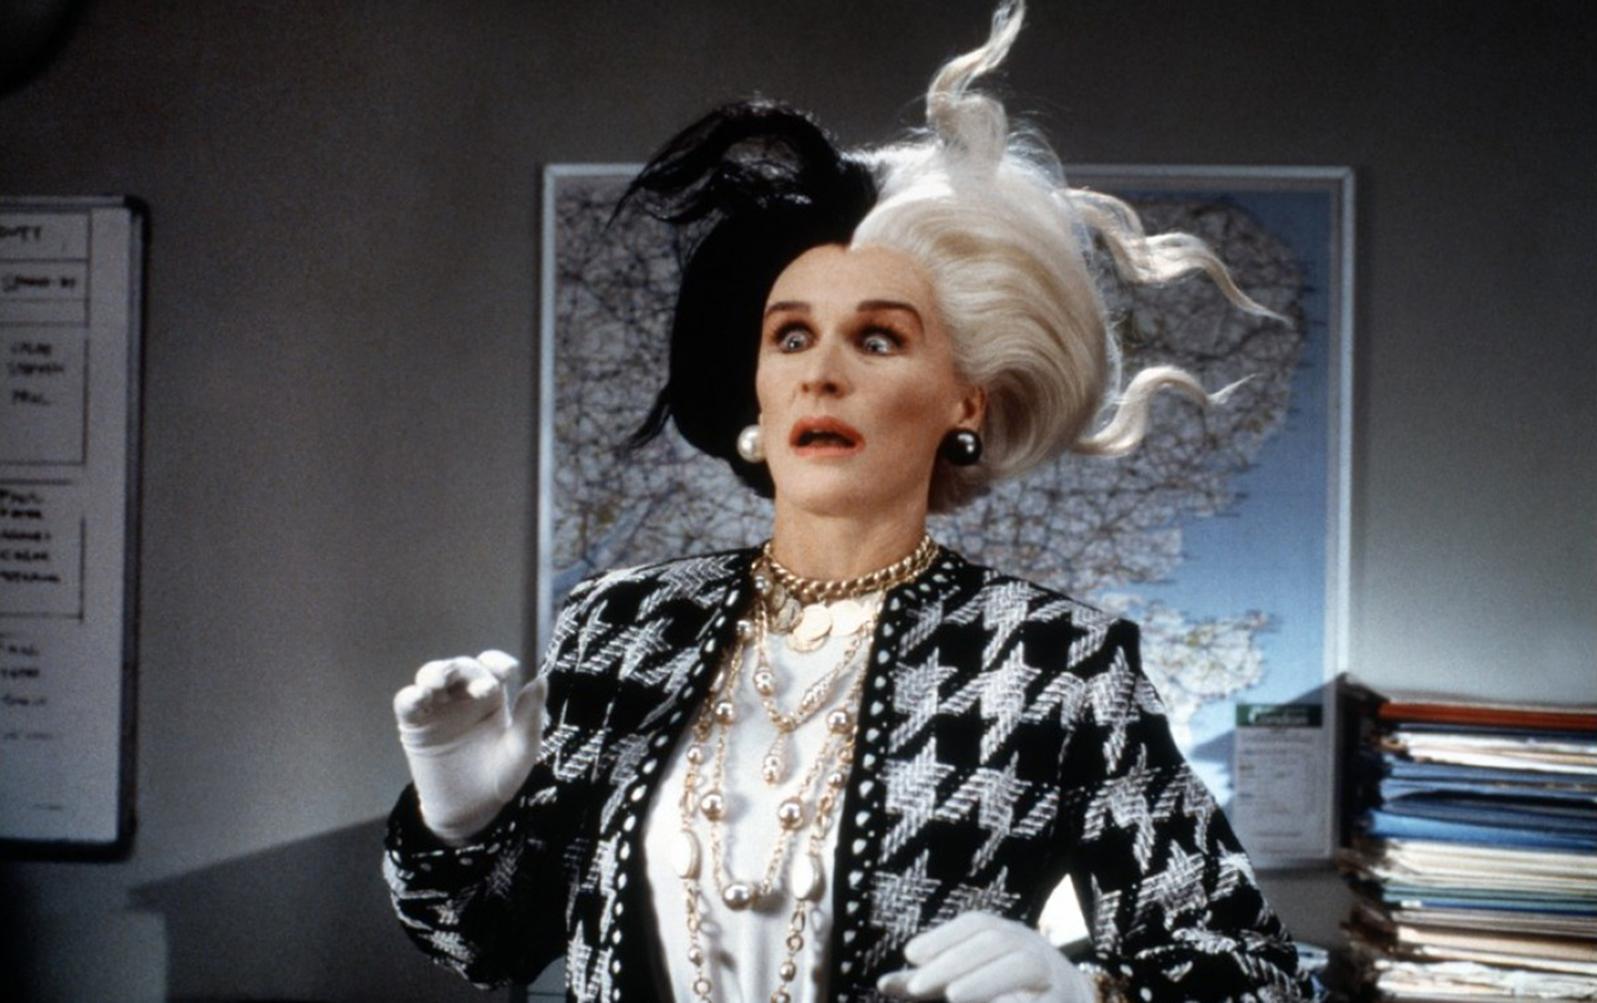 Glenn Close as Cruella De Ville in 101 Dalmatians